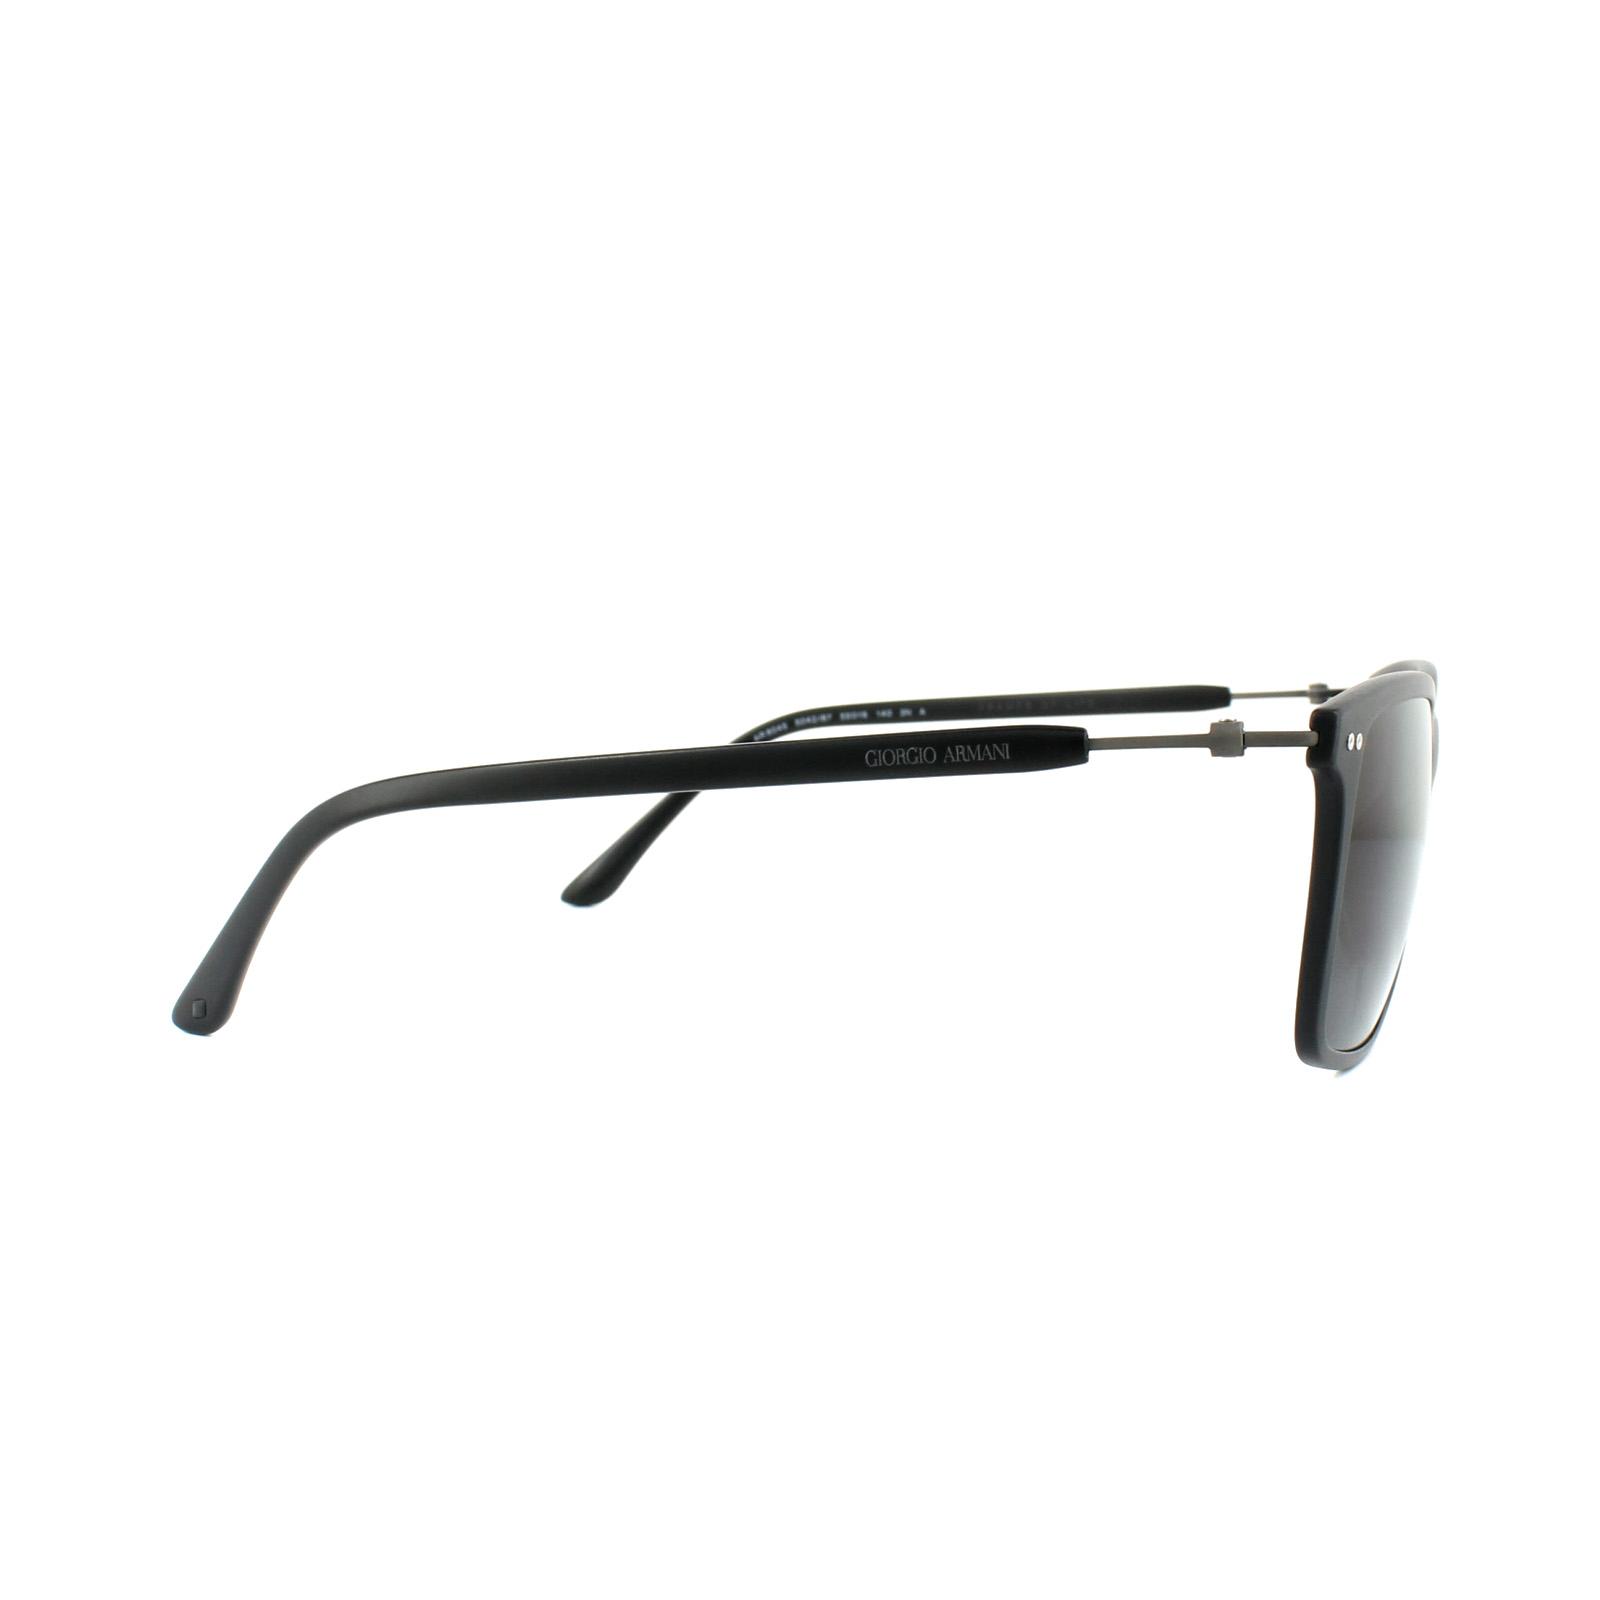 db62a307e78f Sentinel Giorgio Armani Sunglasses AR8045 504287 Matt Black Grey. Sentinel  Thumbnail 4